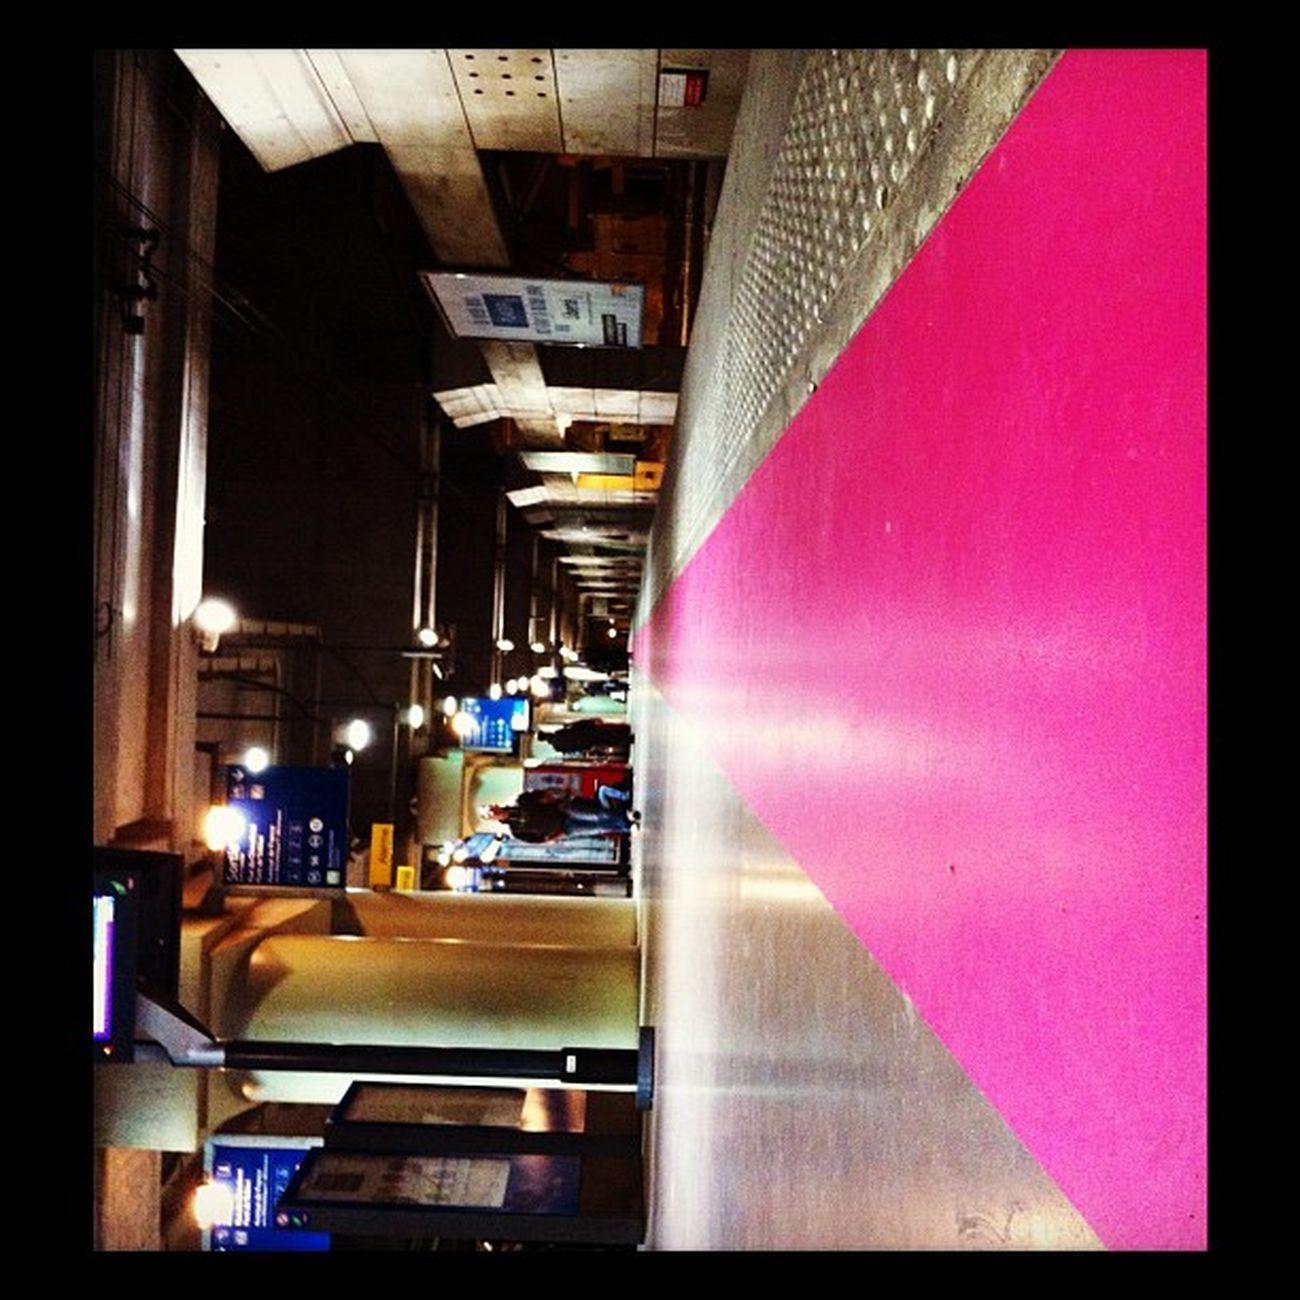 Rerc BFM Rosé Pink pov perspective sncf gare trainstation architecture